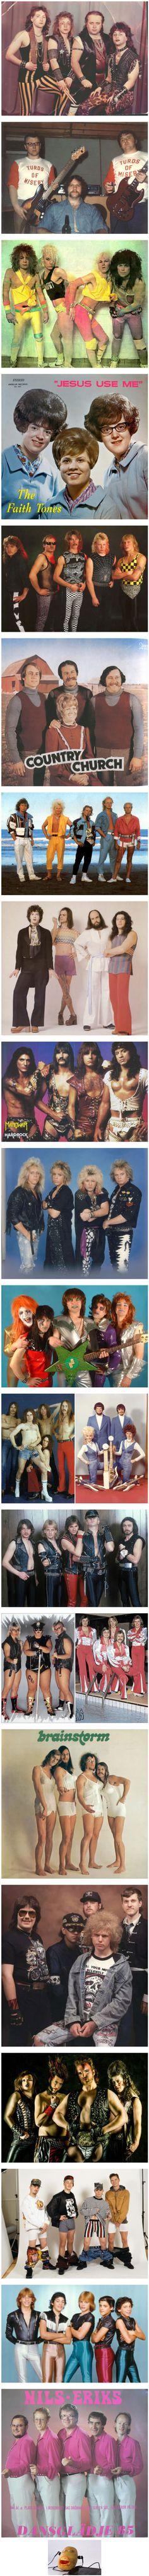 Weirdest Band Photos Ever